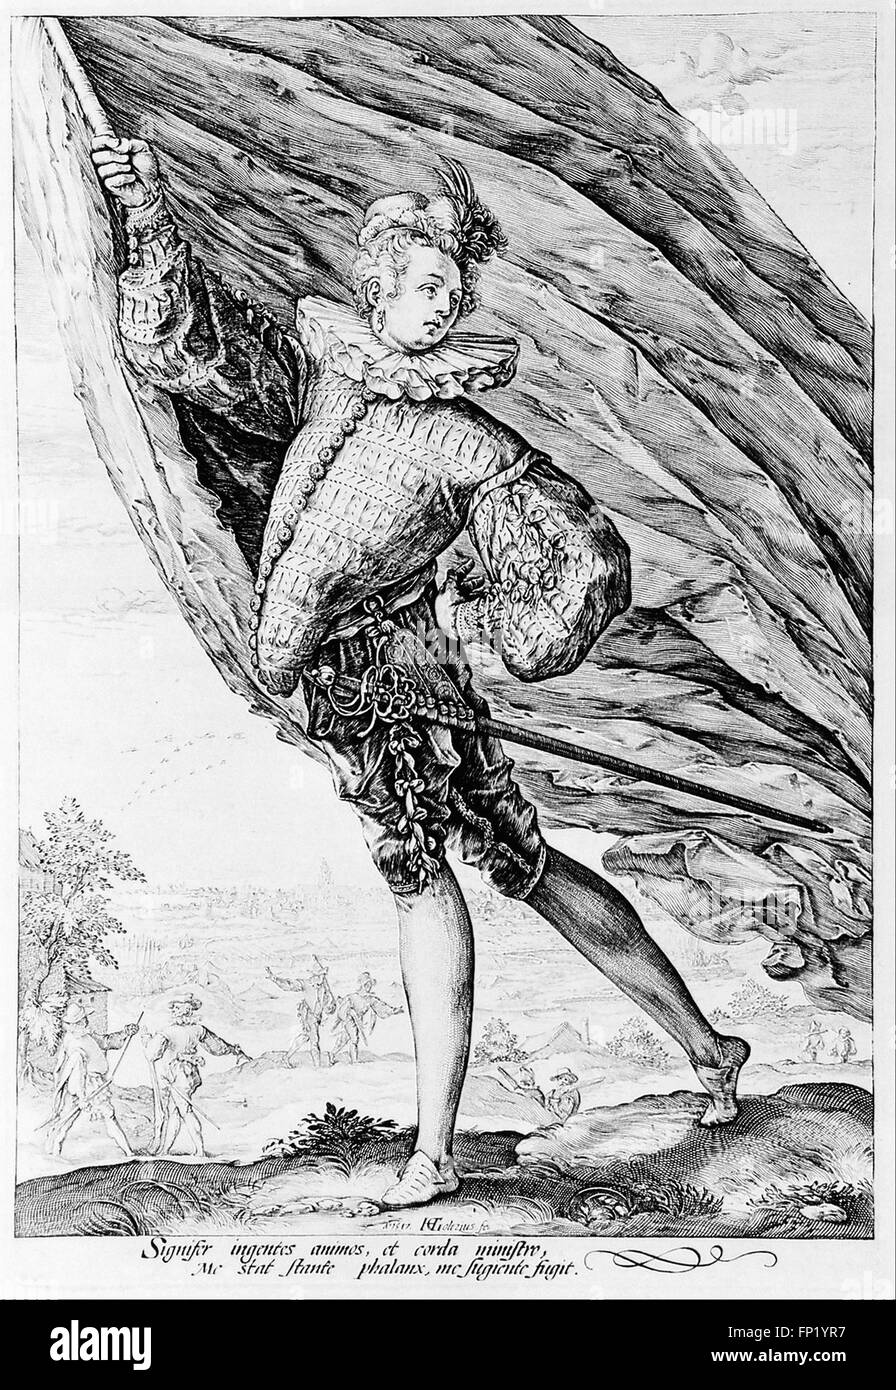 Hendrick Goltzius - The great standard-bearer - Stock Image